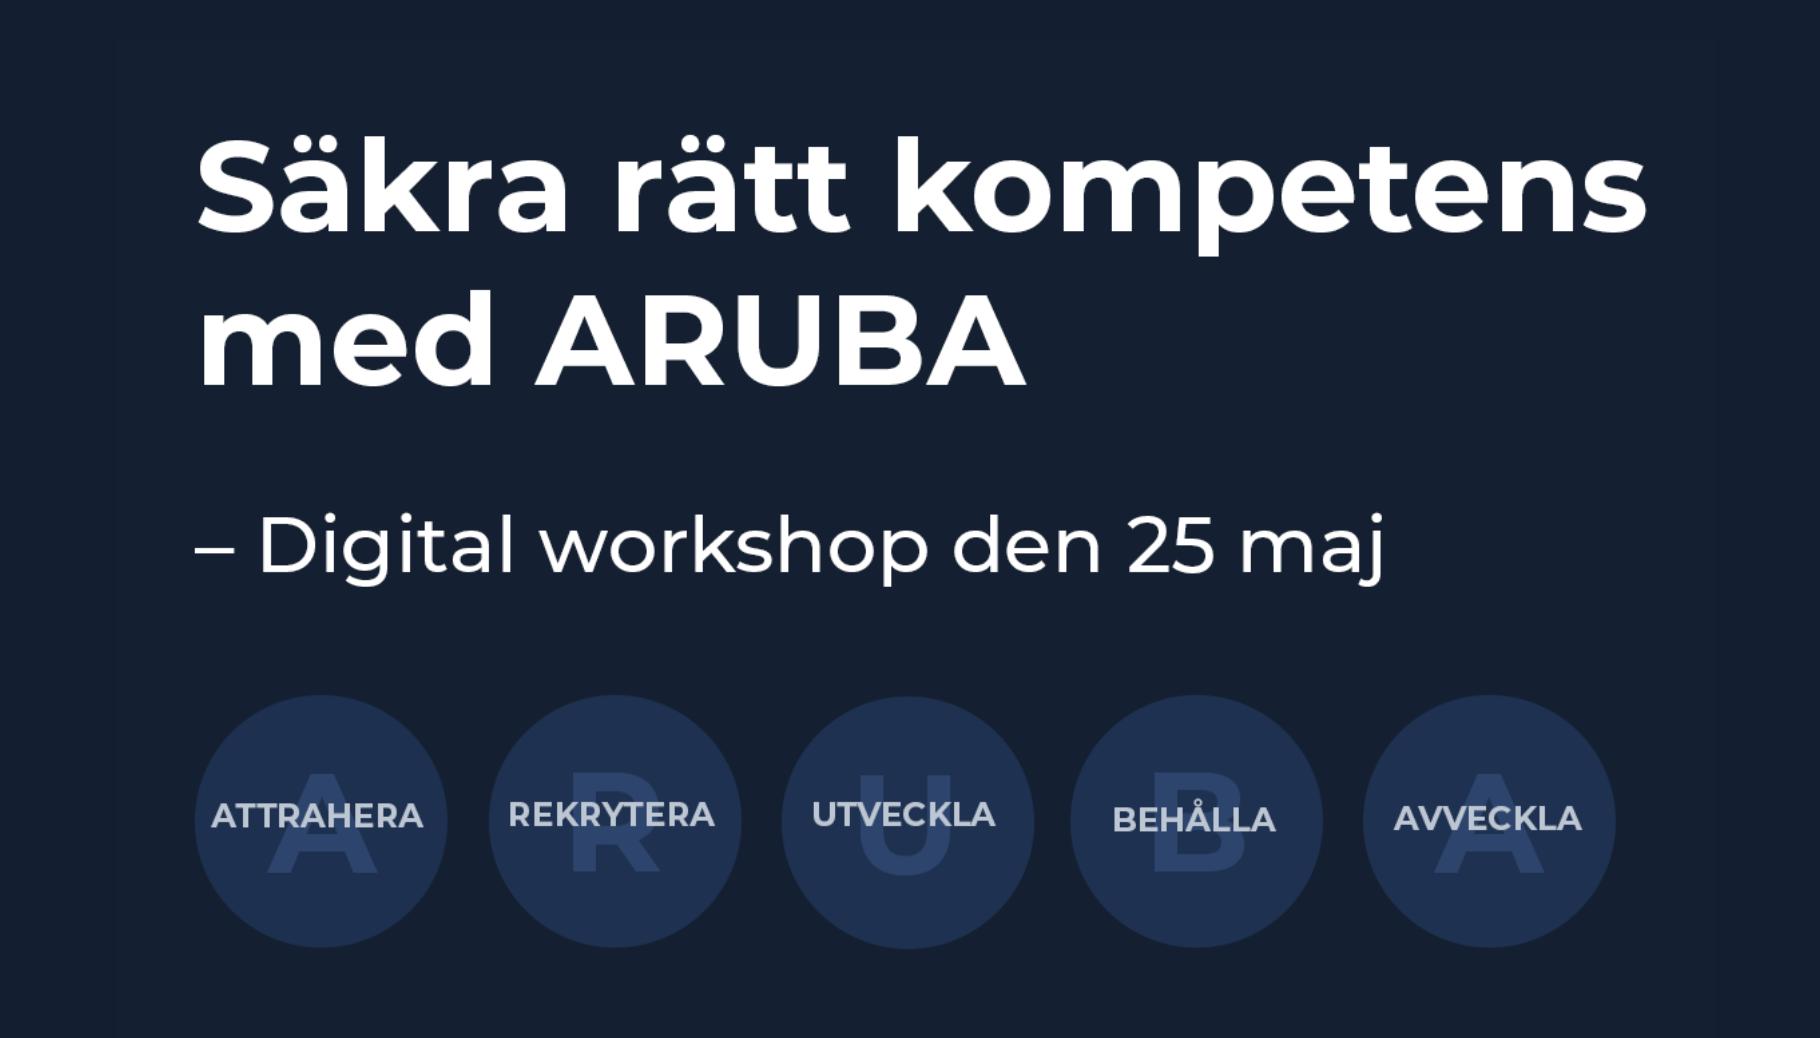 Digital workshop: ARUBA 25 maj